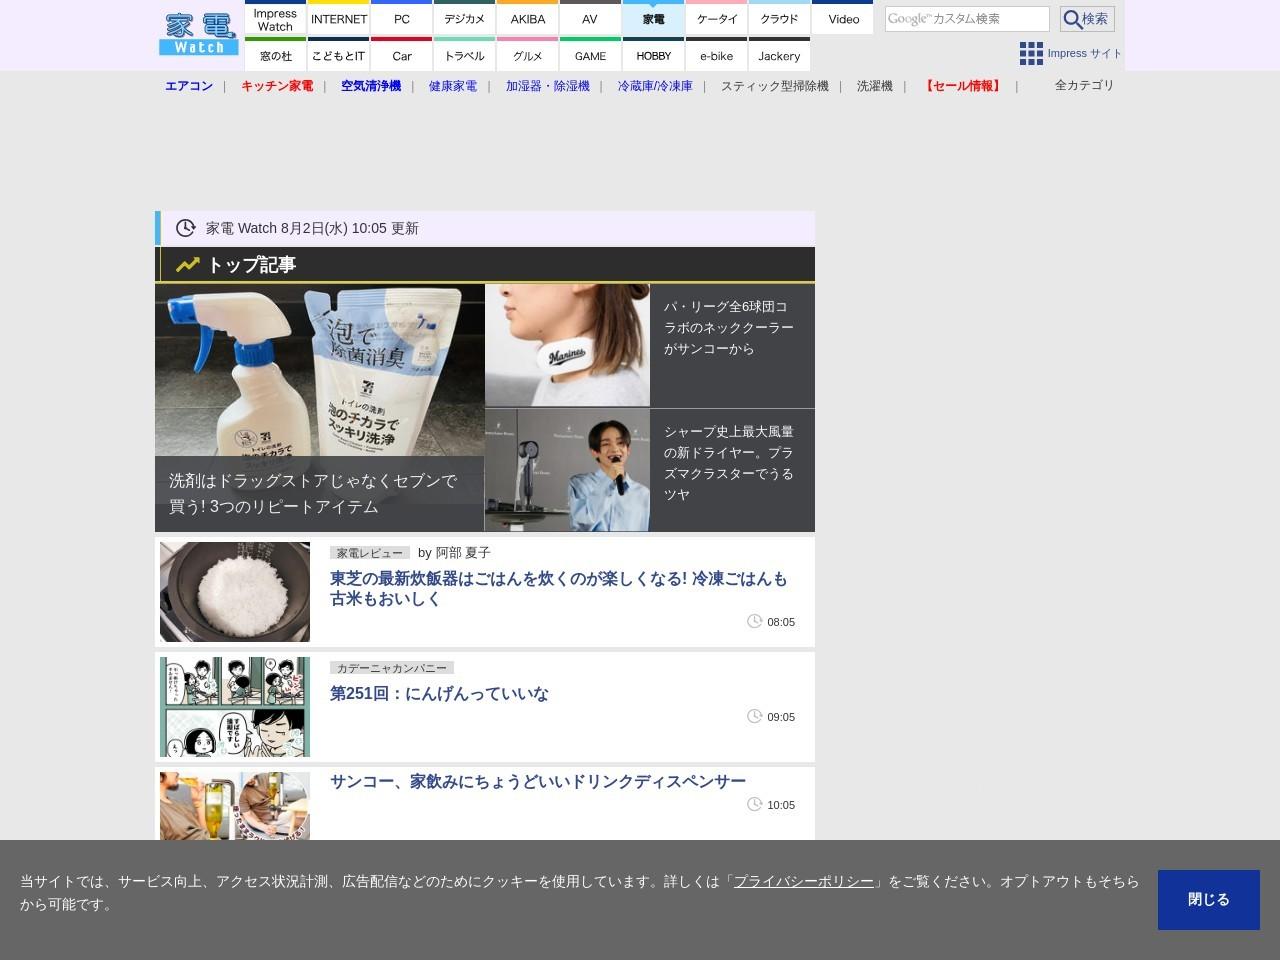 https://kaden.watch.impress.co.jp/docs/news/1268852.htmlのプレビュー画像